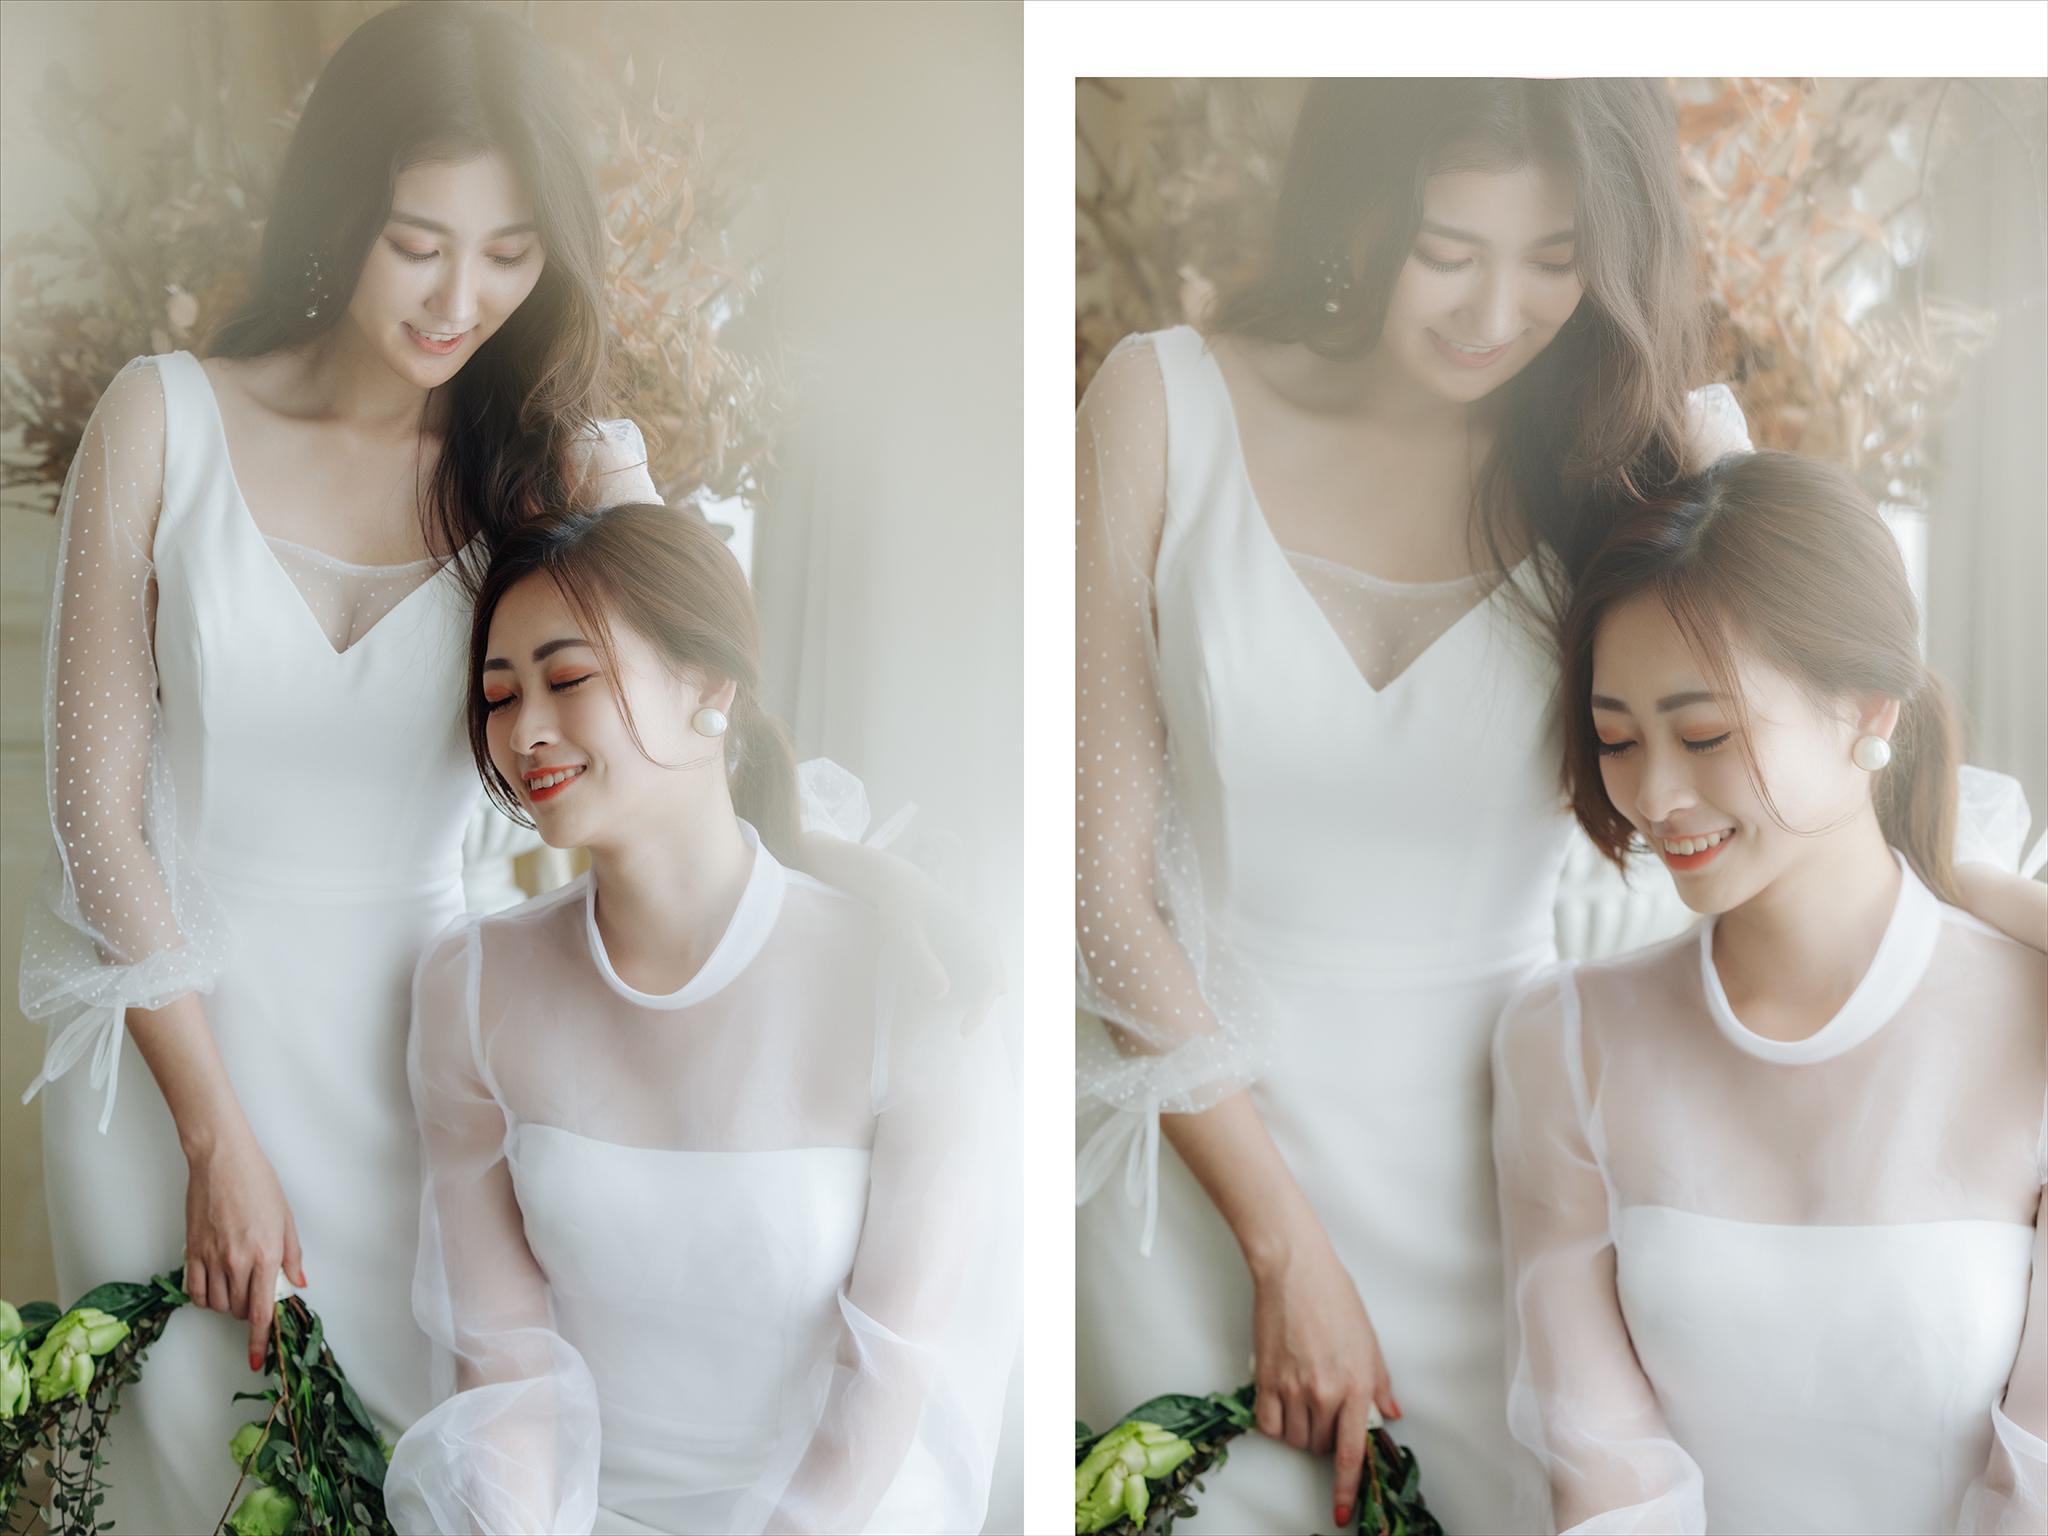 49929557417 5f64b99054 o - 【閨蜜婚紗】+Jessy & Tiffany+